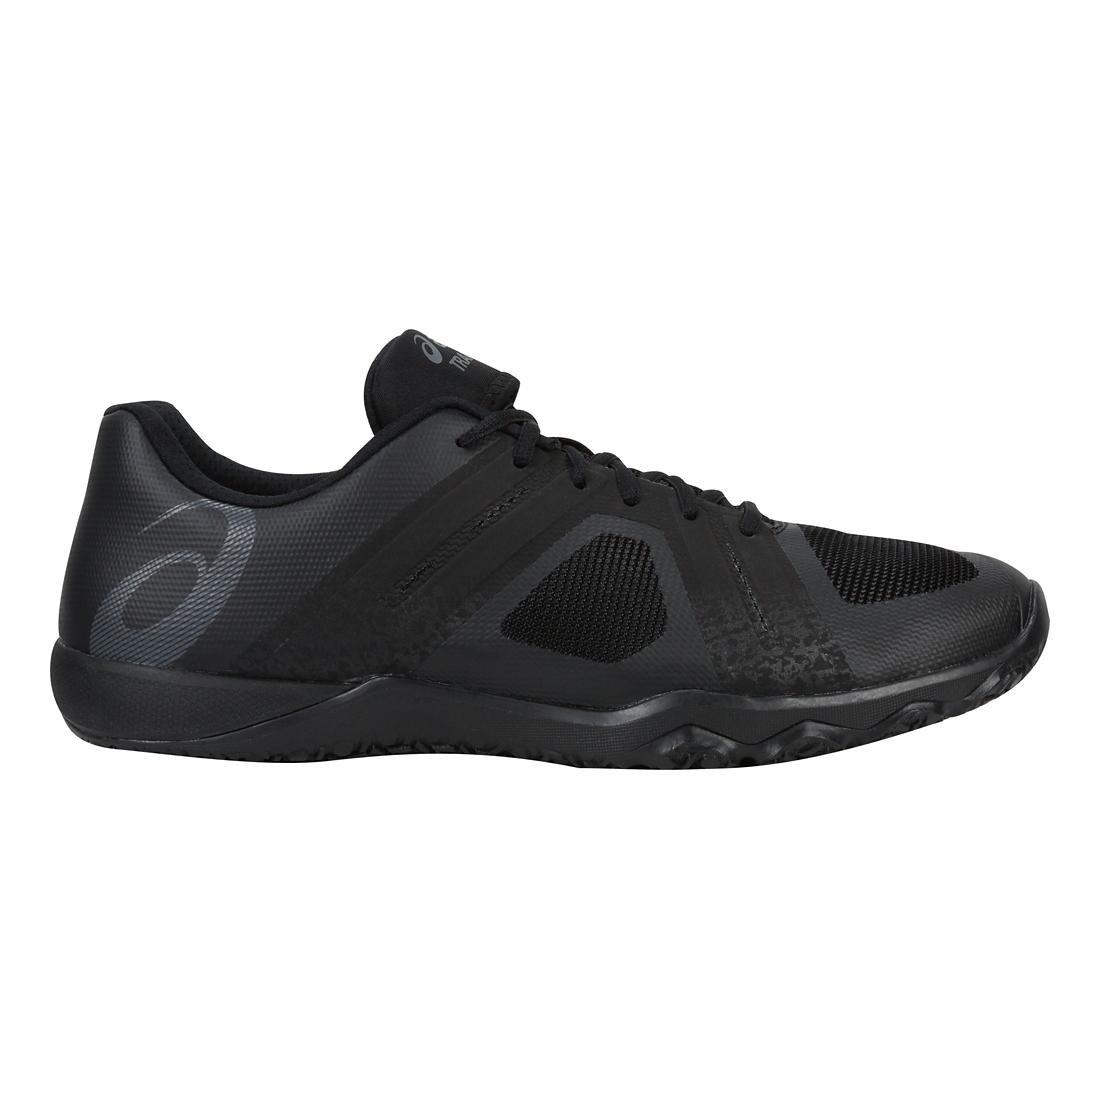 ASICS Men's Conviction X 2 Training Shoe B071F7NGDN 12 D(M) US Black/Carbon/Sulphur Springs